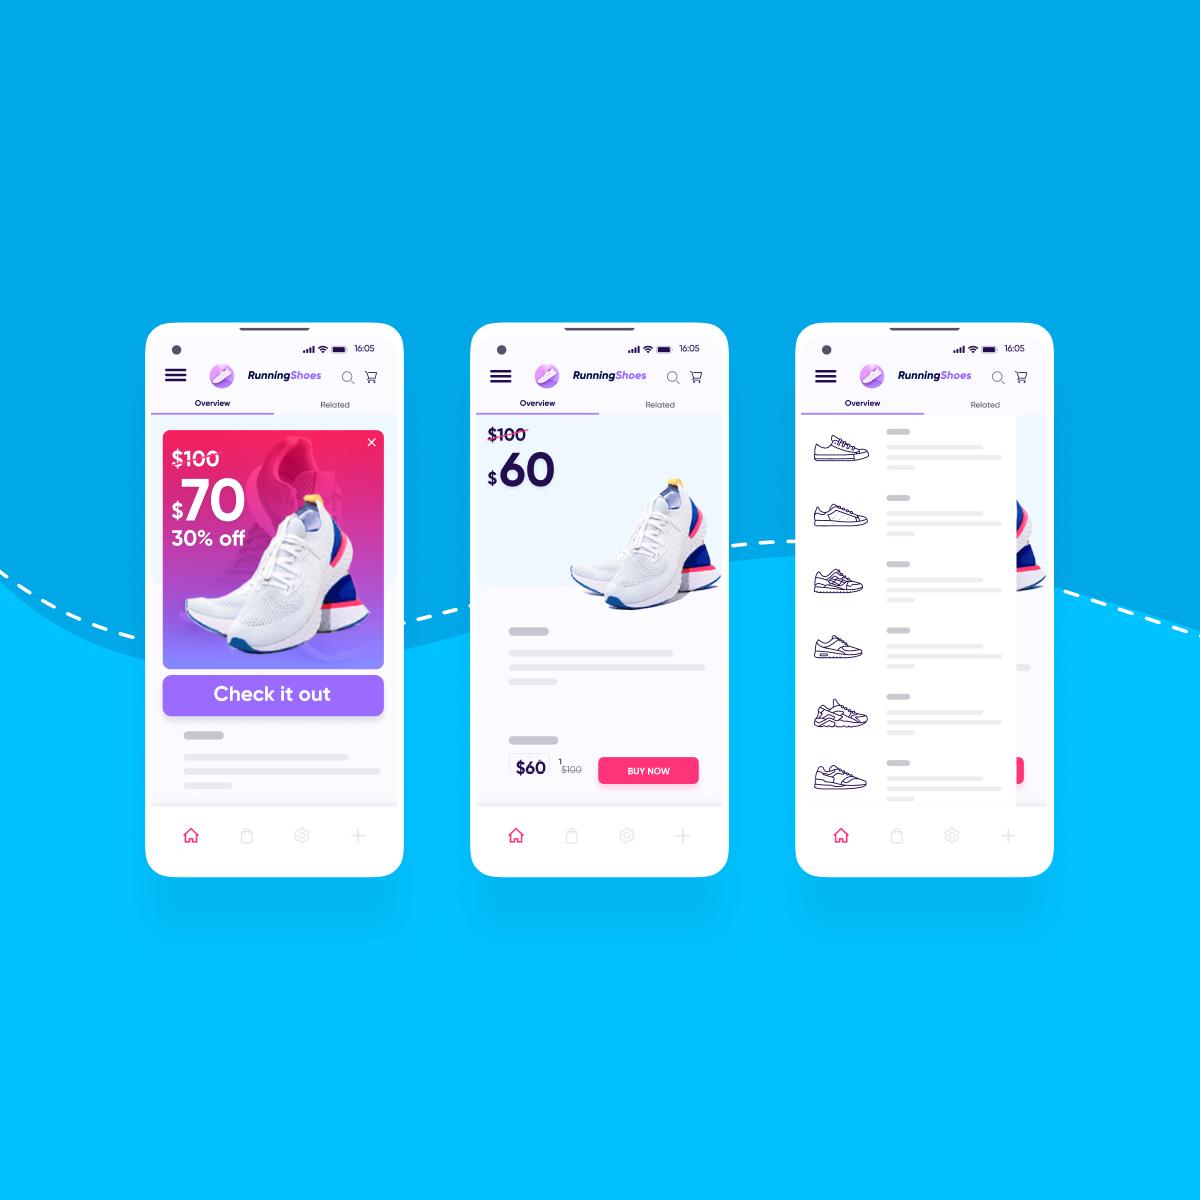 Mobile app UX - square featured